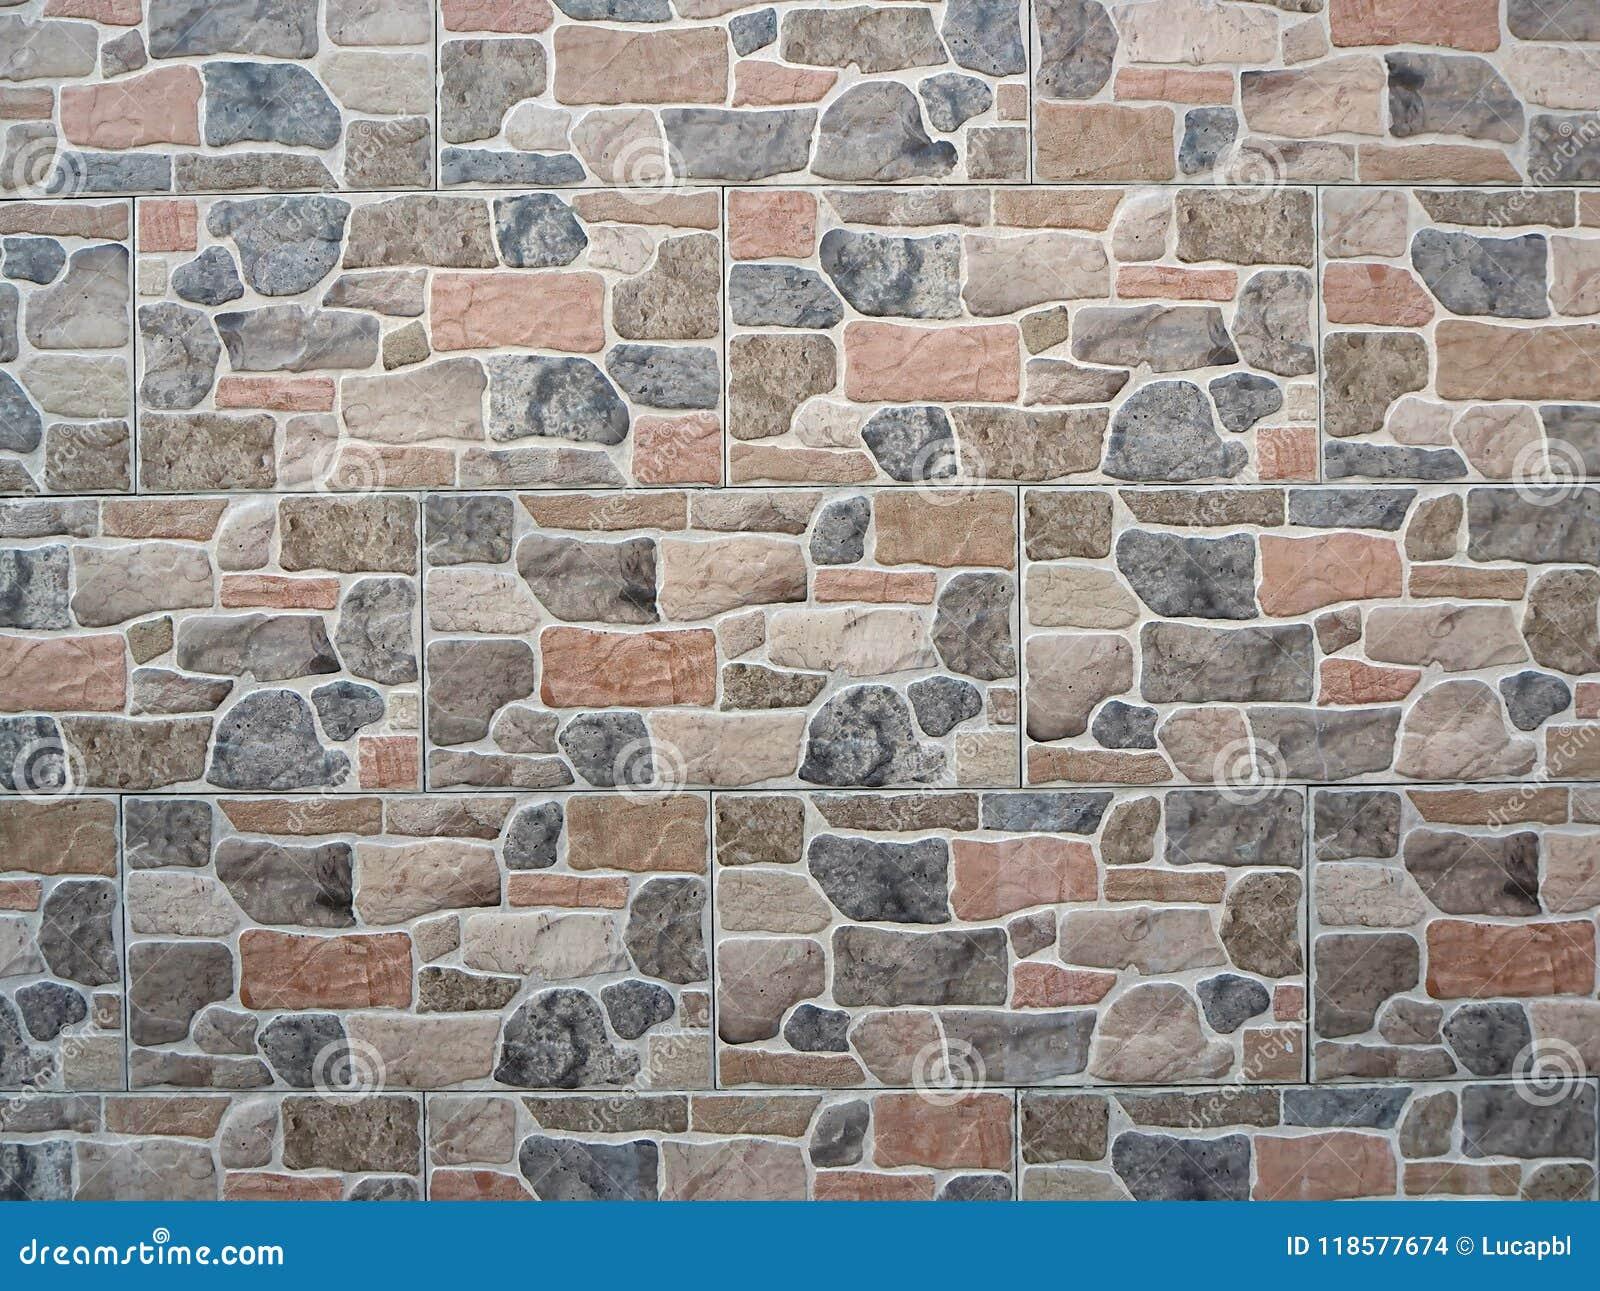 Faux Stone Wall Cladding For Exterior Facades Or Fences Stock Photo ...